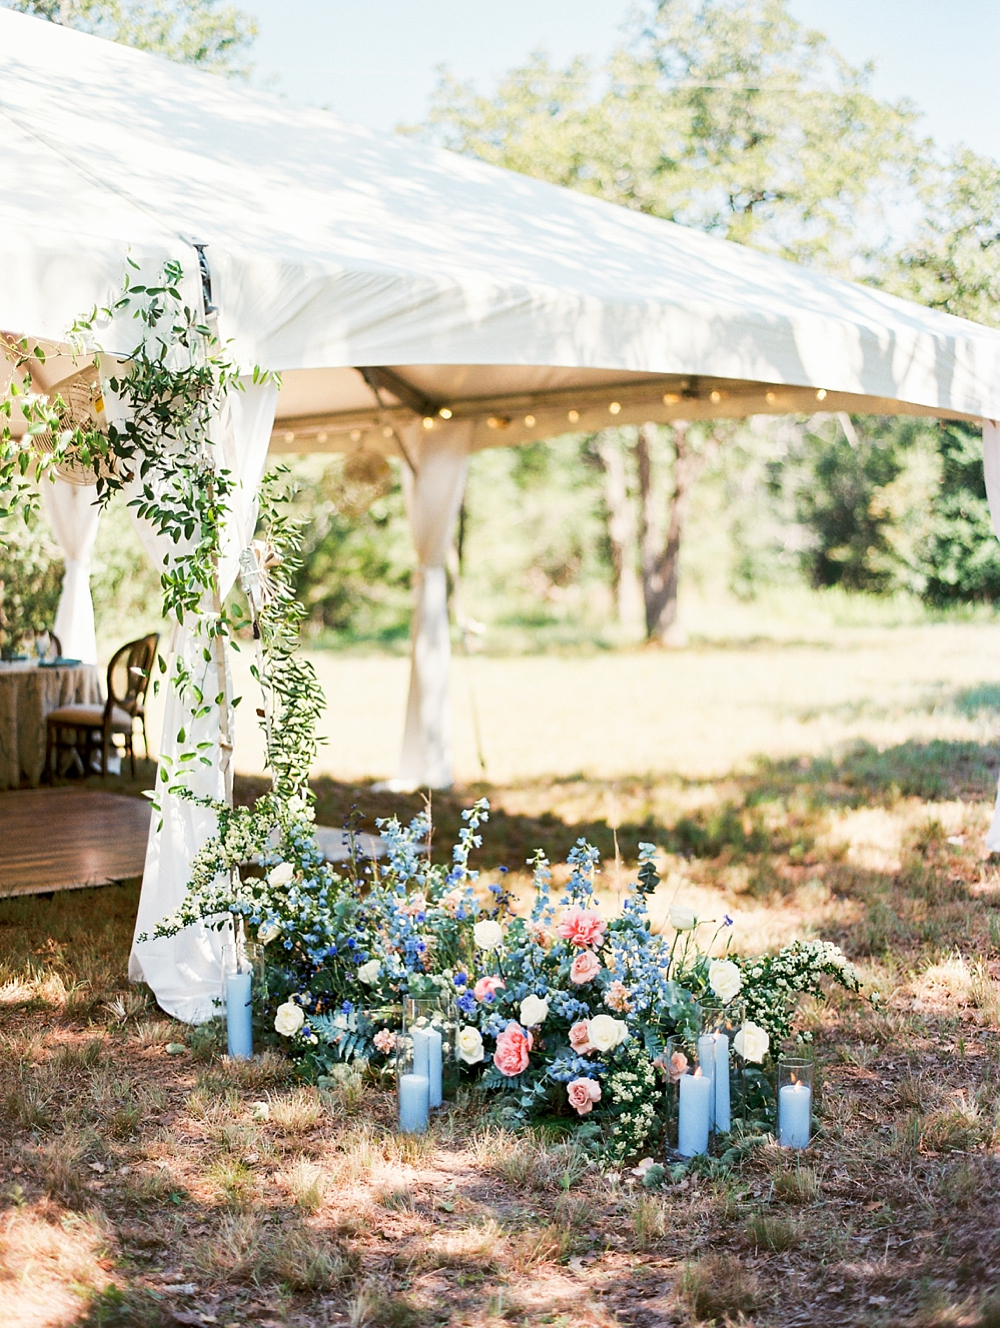 Kristin-La-Voie-Photography-Austin-Wedding-Photographer-the-grand-lady-41